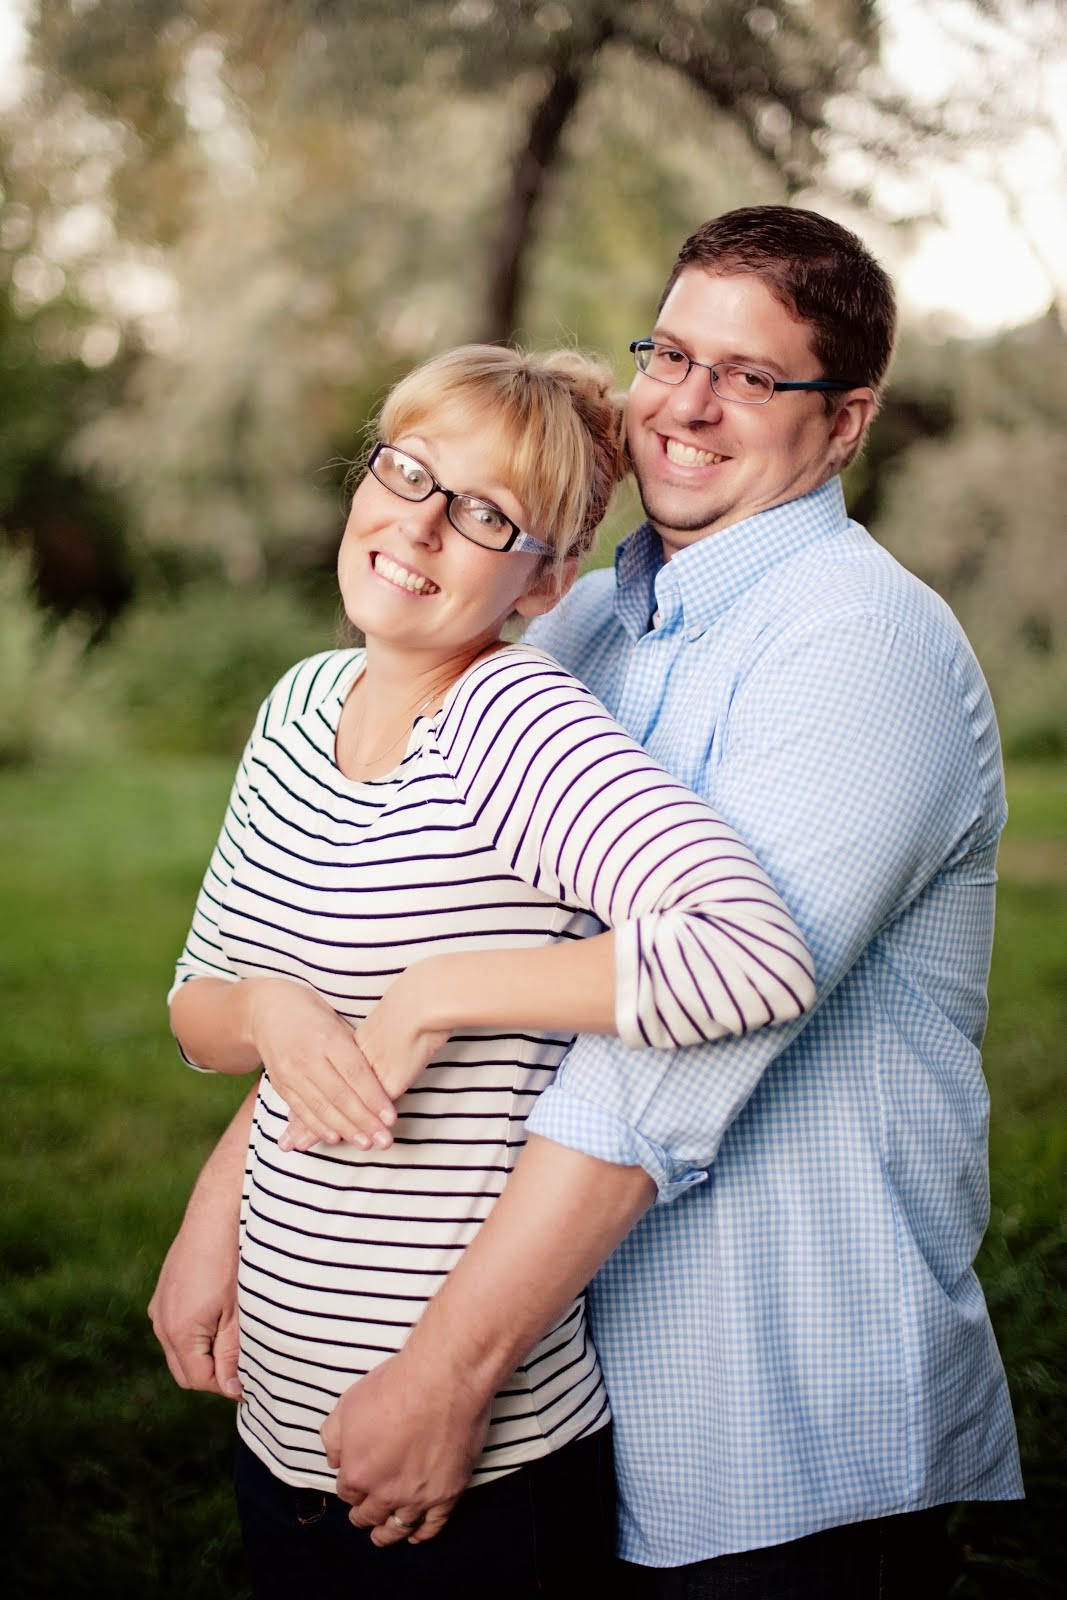 Me & Husband